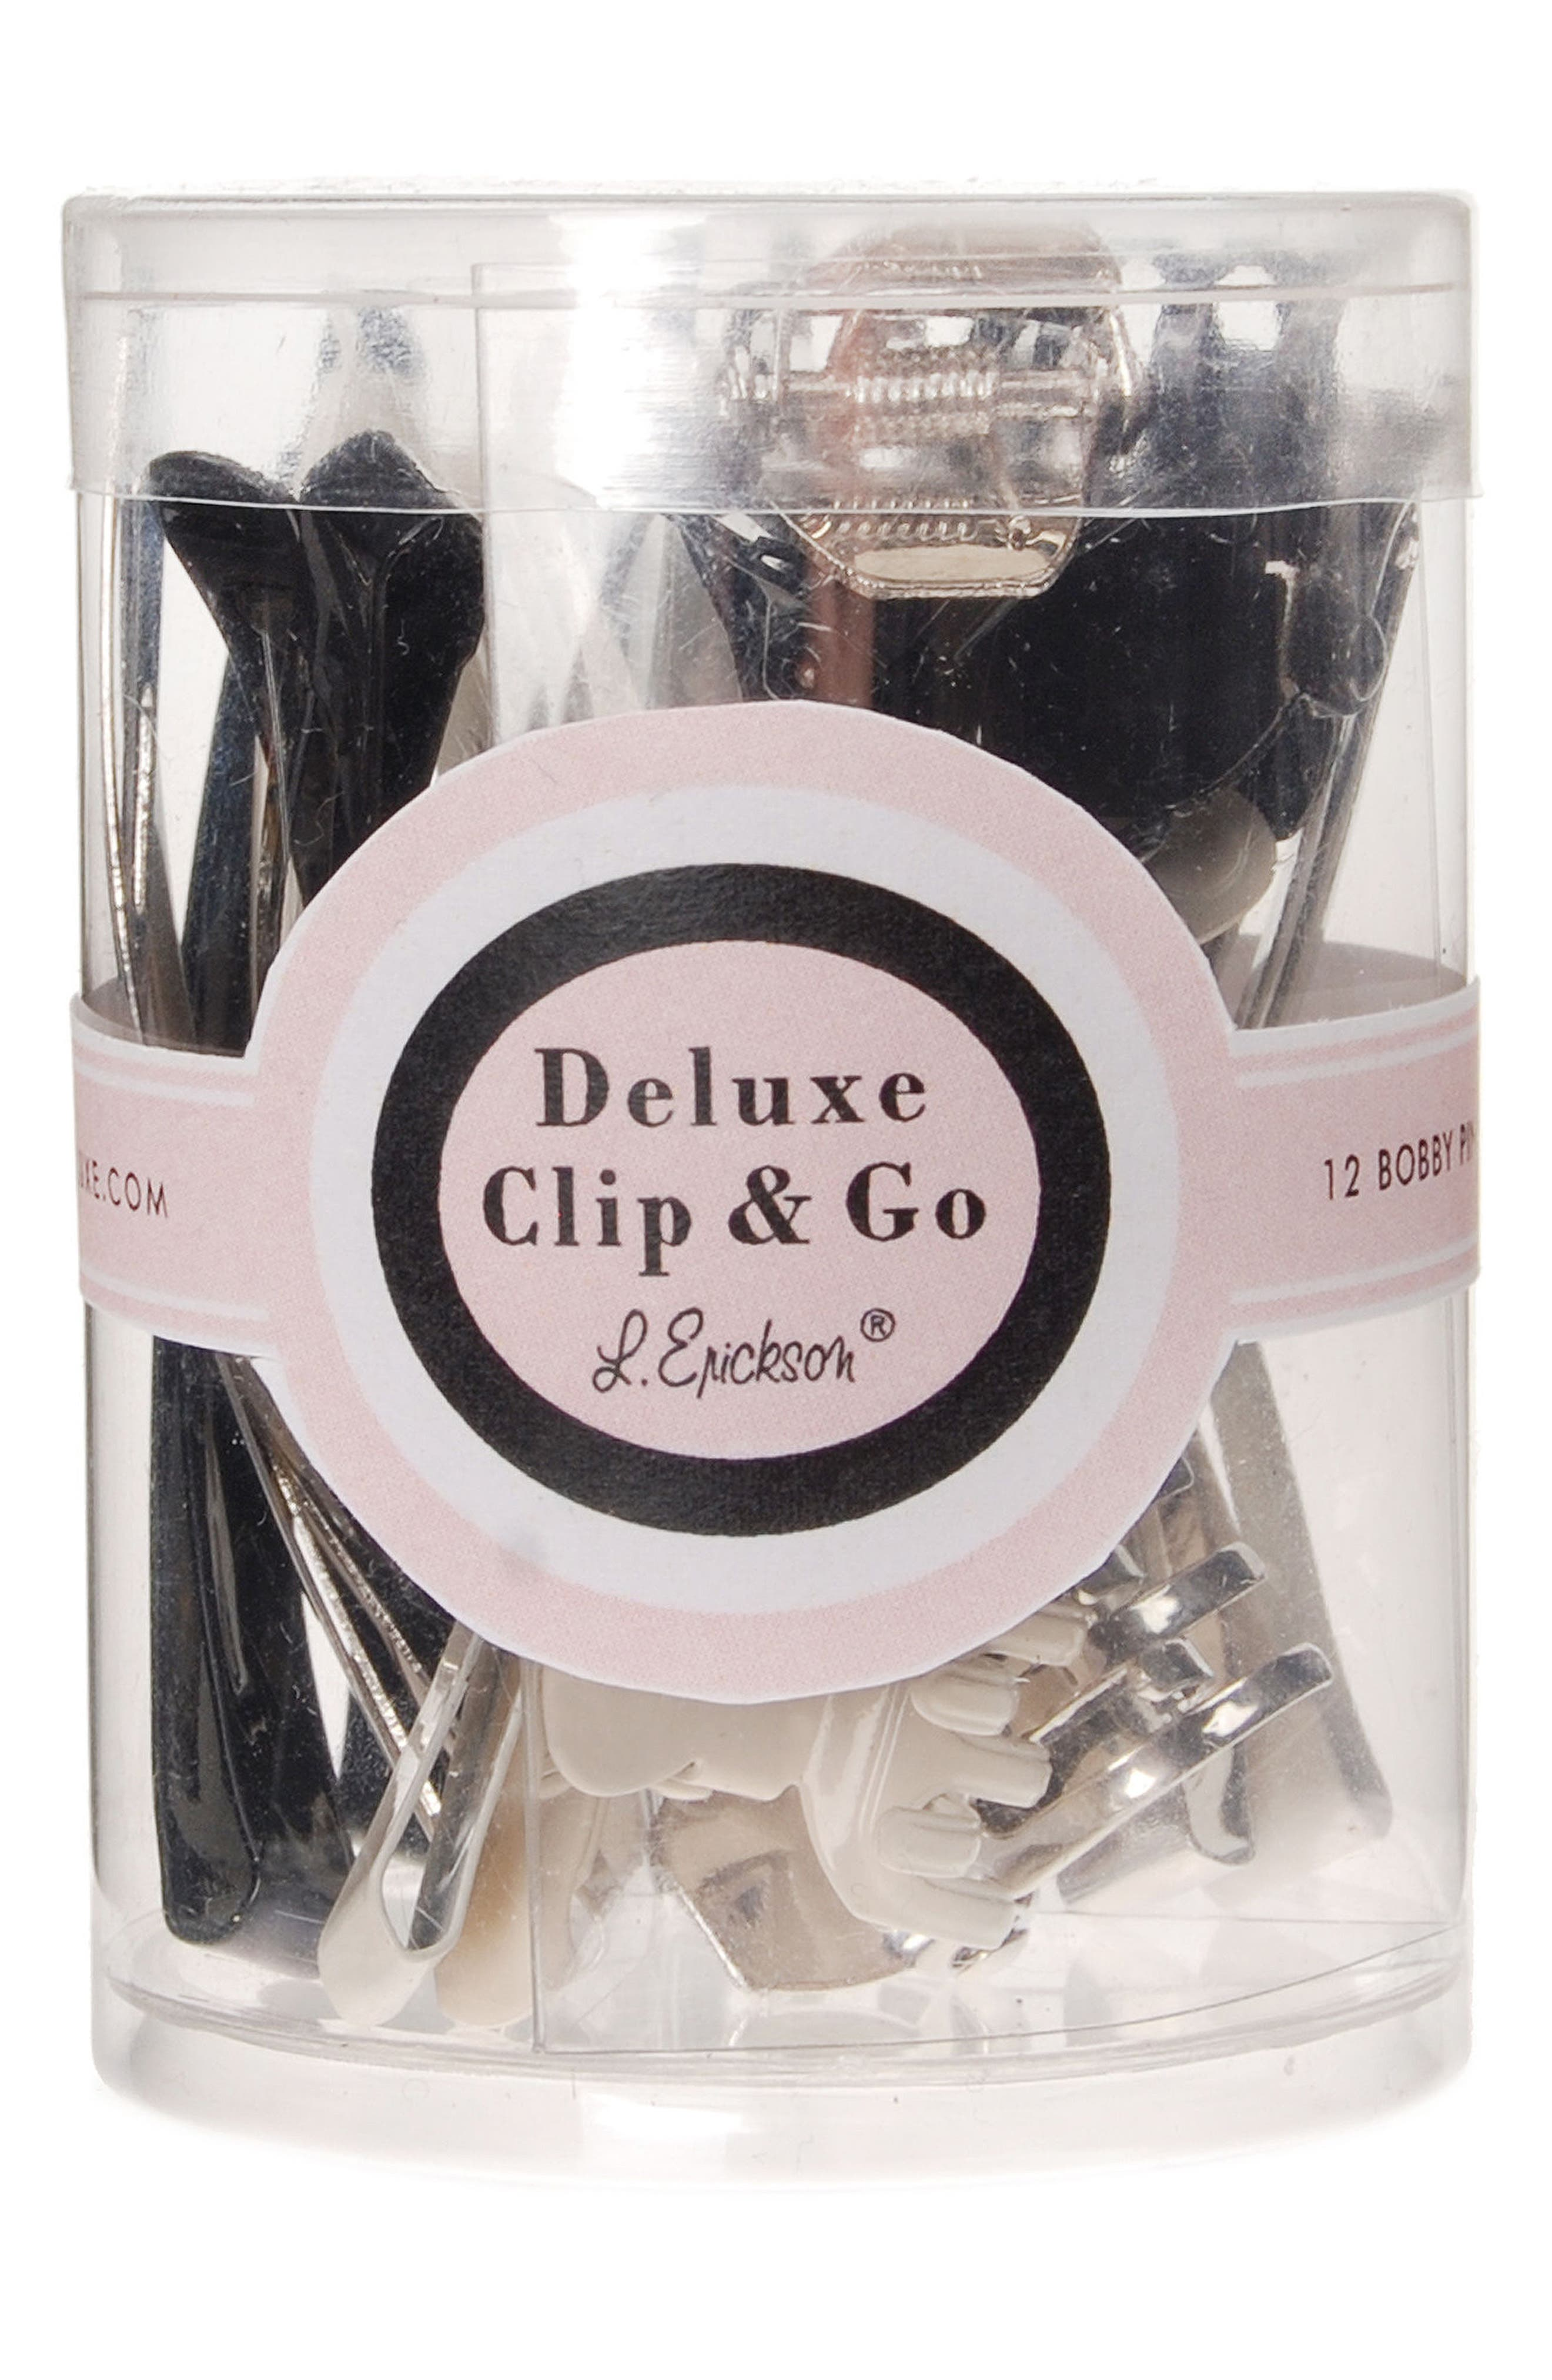 L. ERICKSON Deluxe Clip & Go Kit